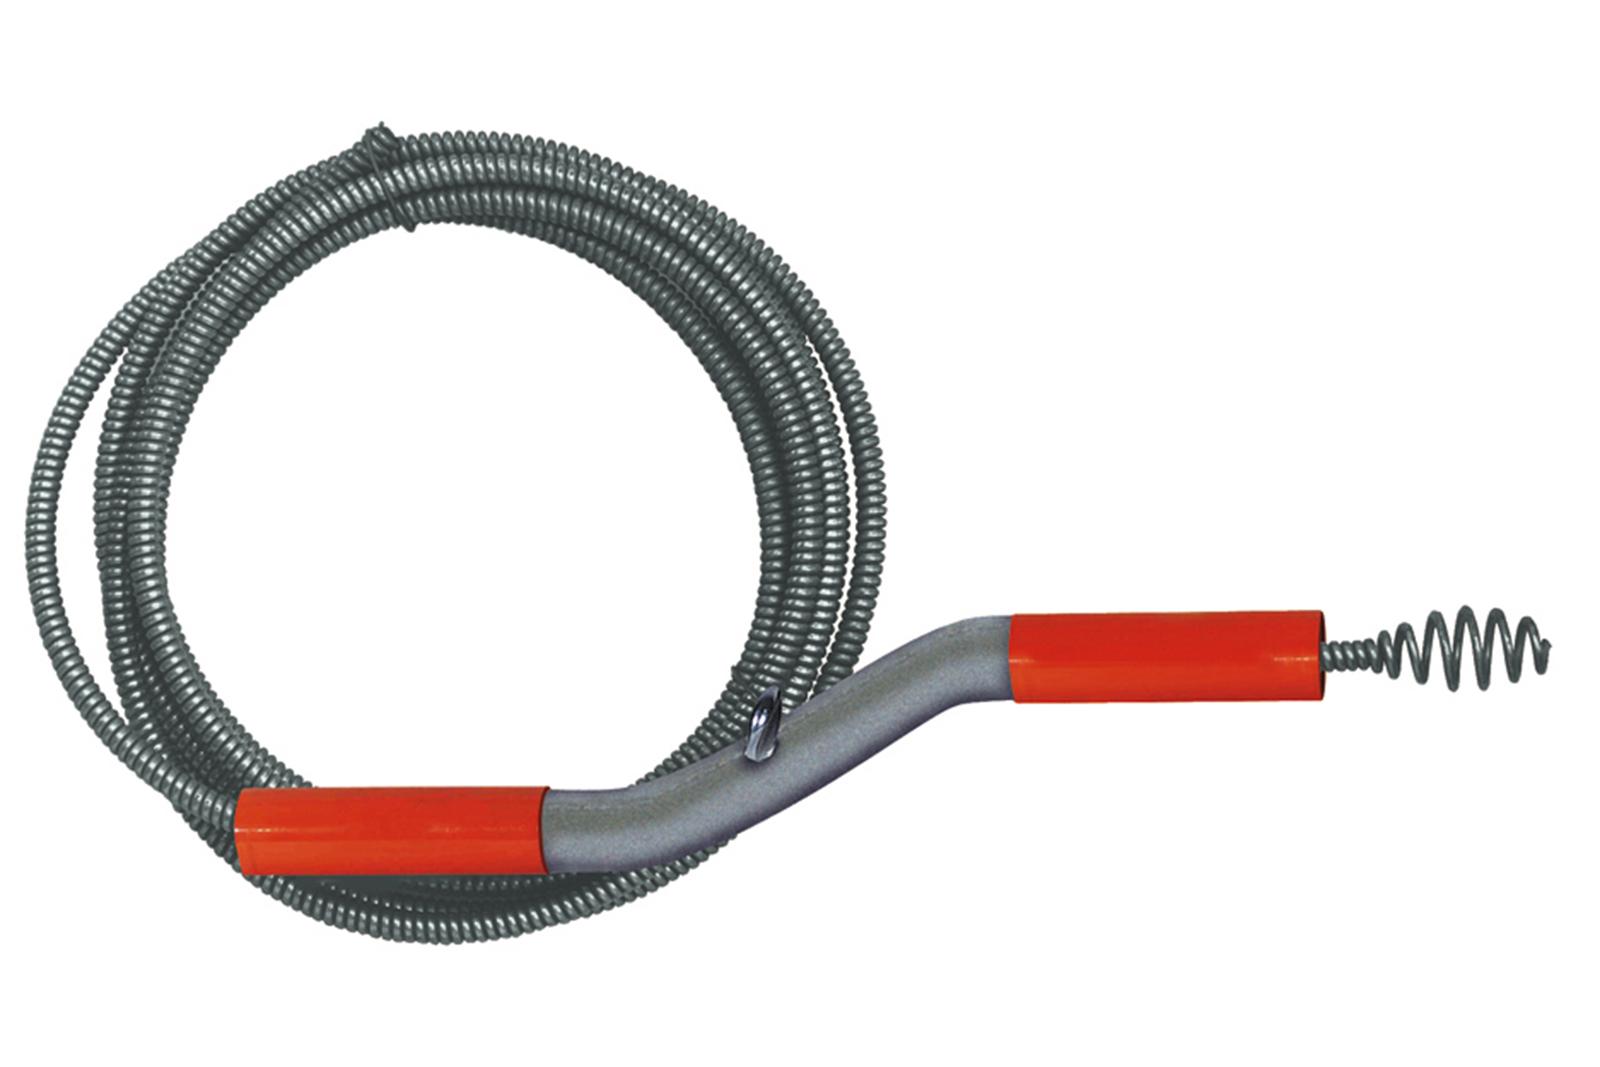 Купить Трос для прочистки General pipe Flexicore 15fl1